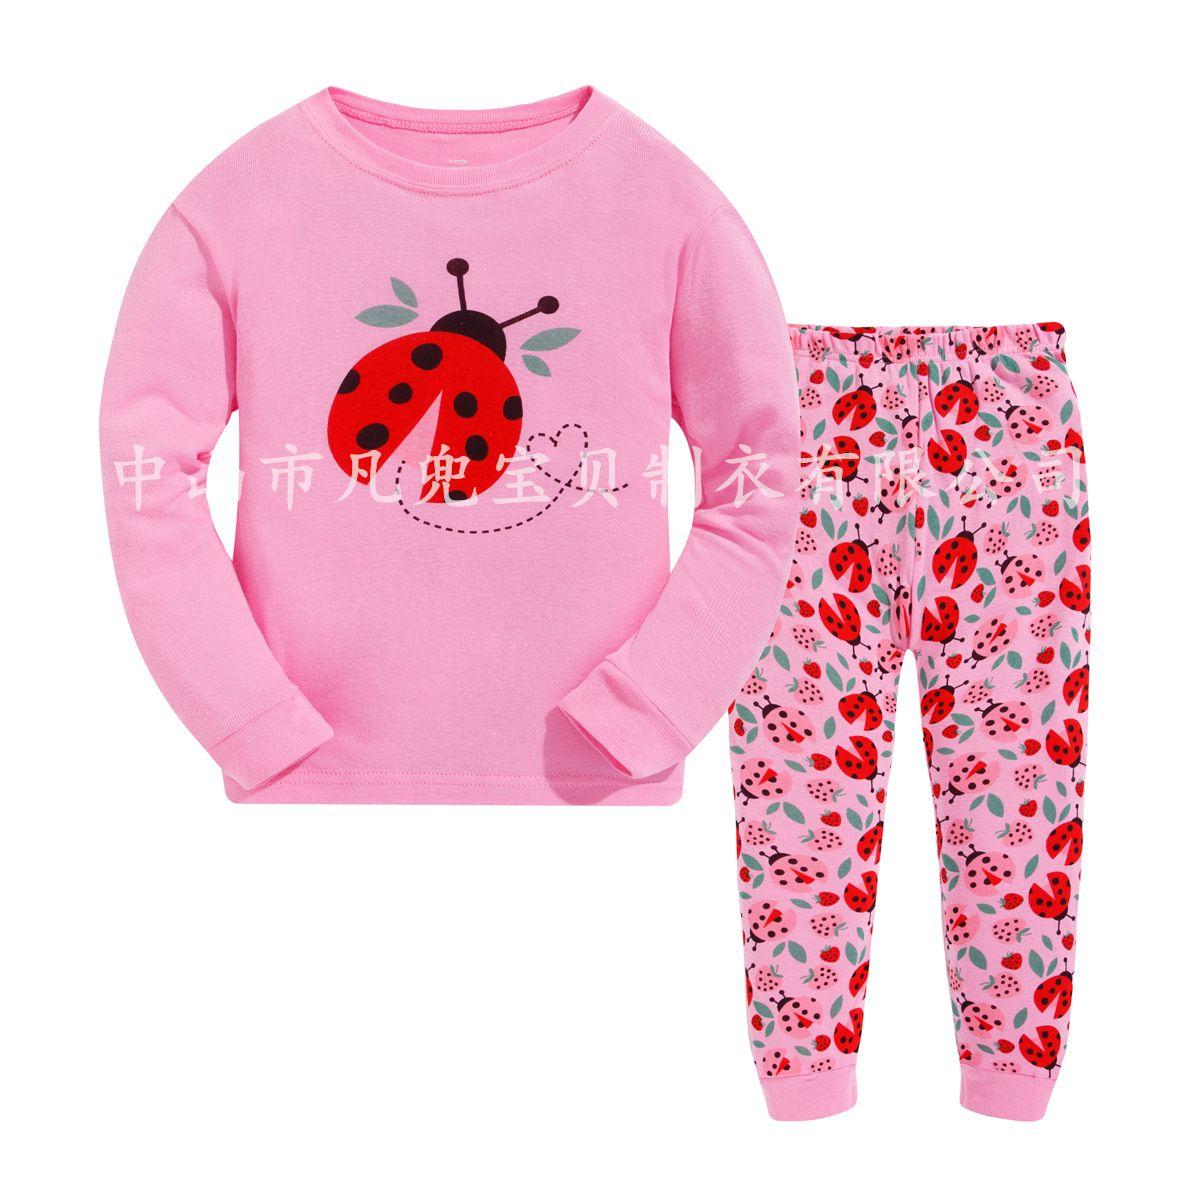 45811effe78a Hotsale Children Pajamas Girls Nightwear Pink Pyjamas Two Pieces Set ...